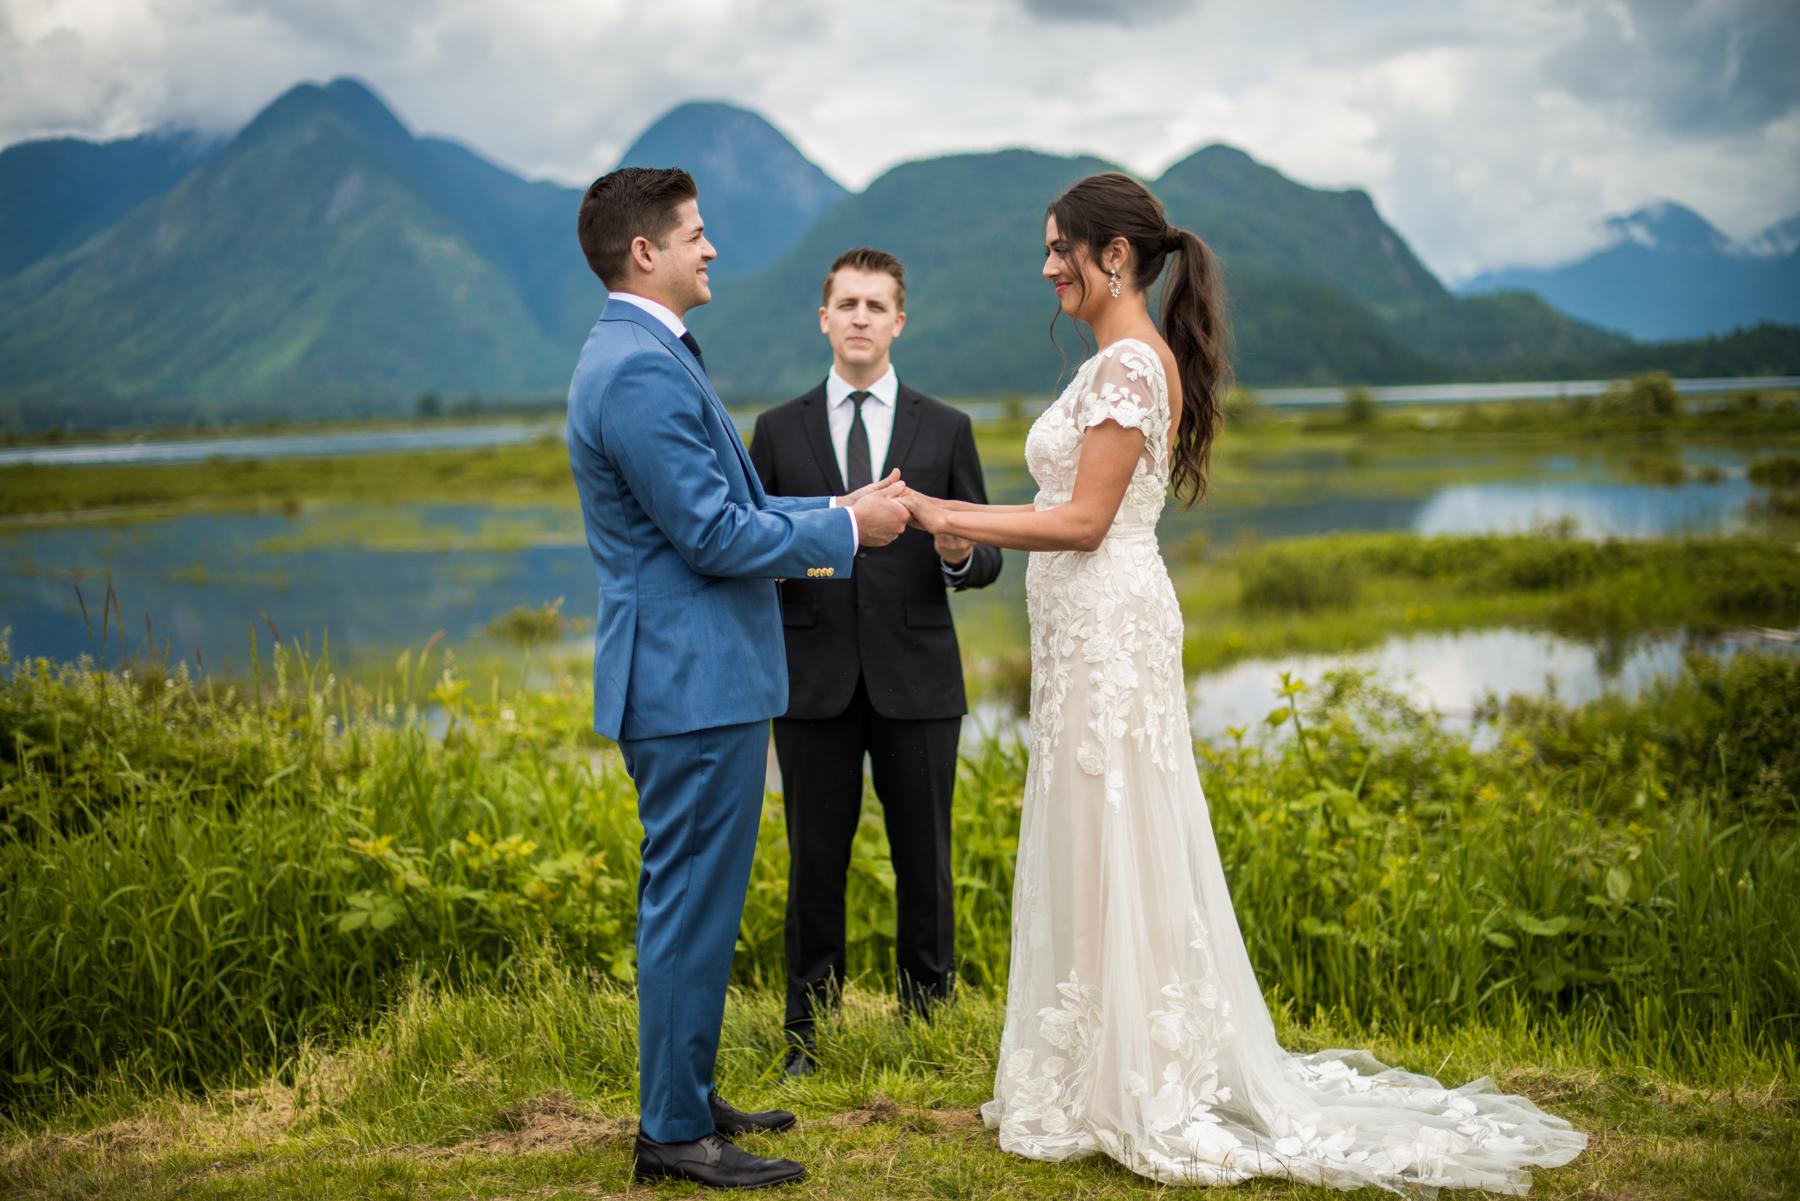 dp-wedding-web-086